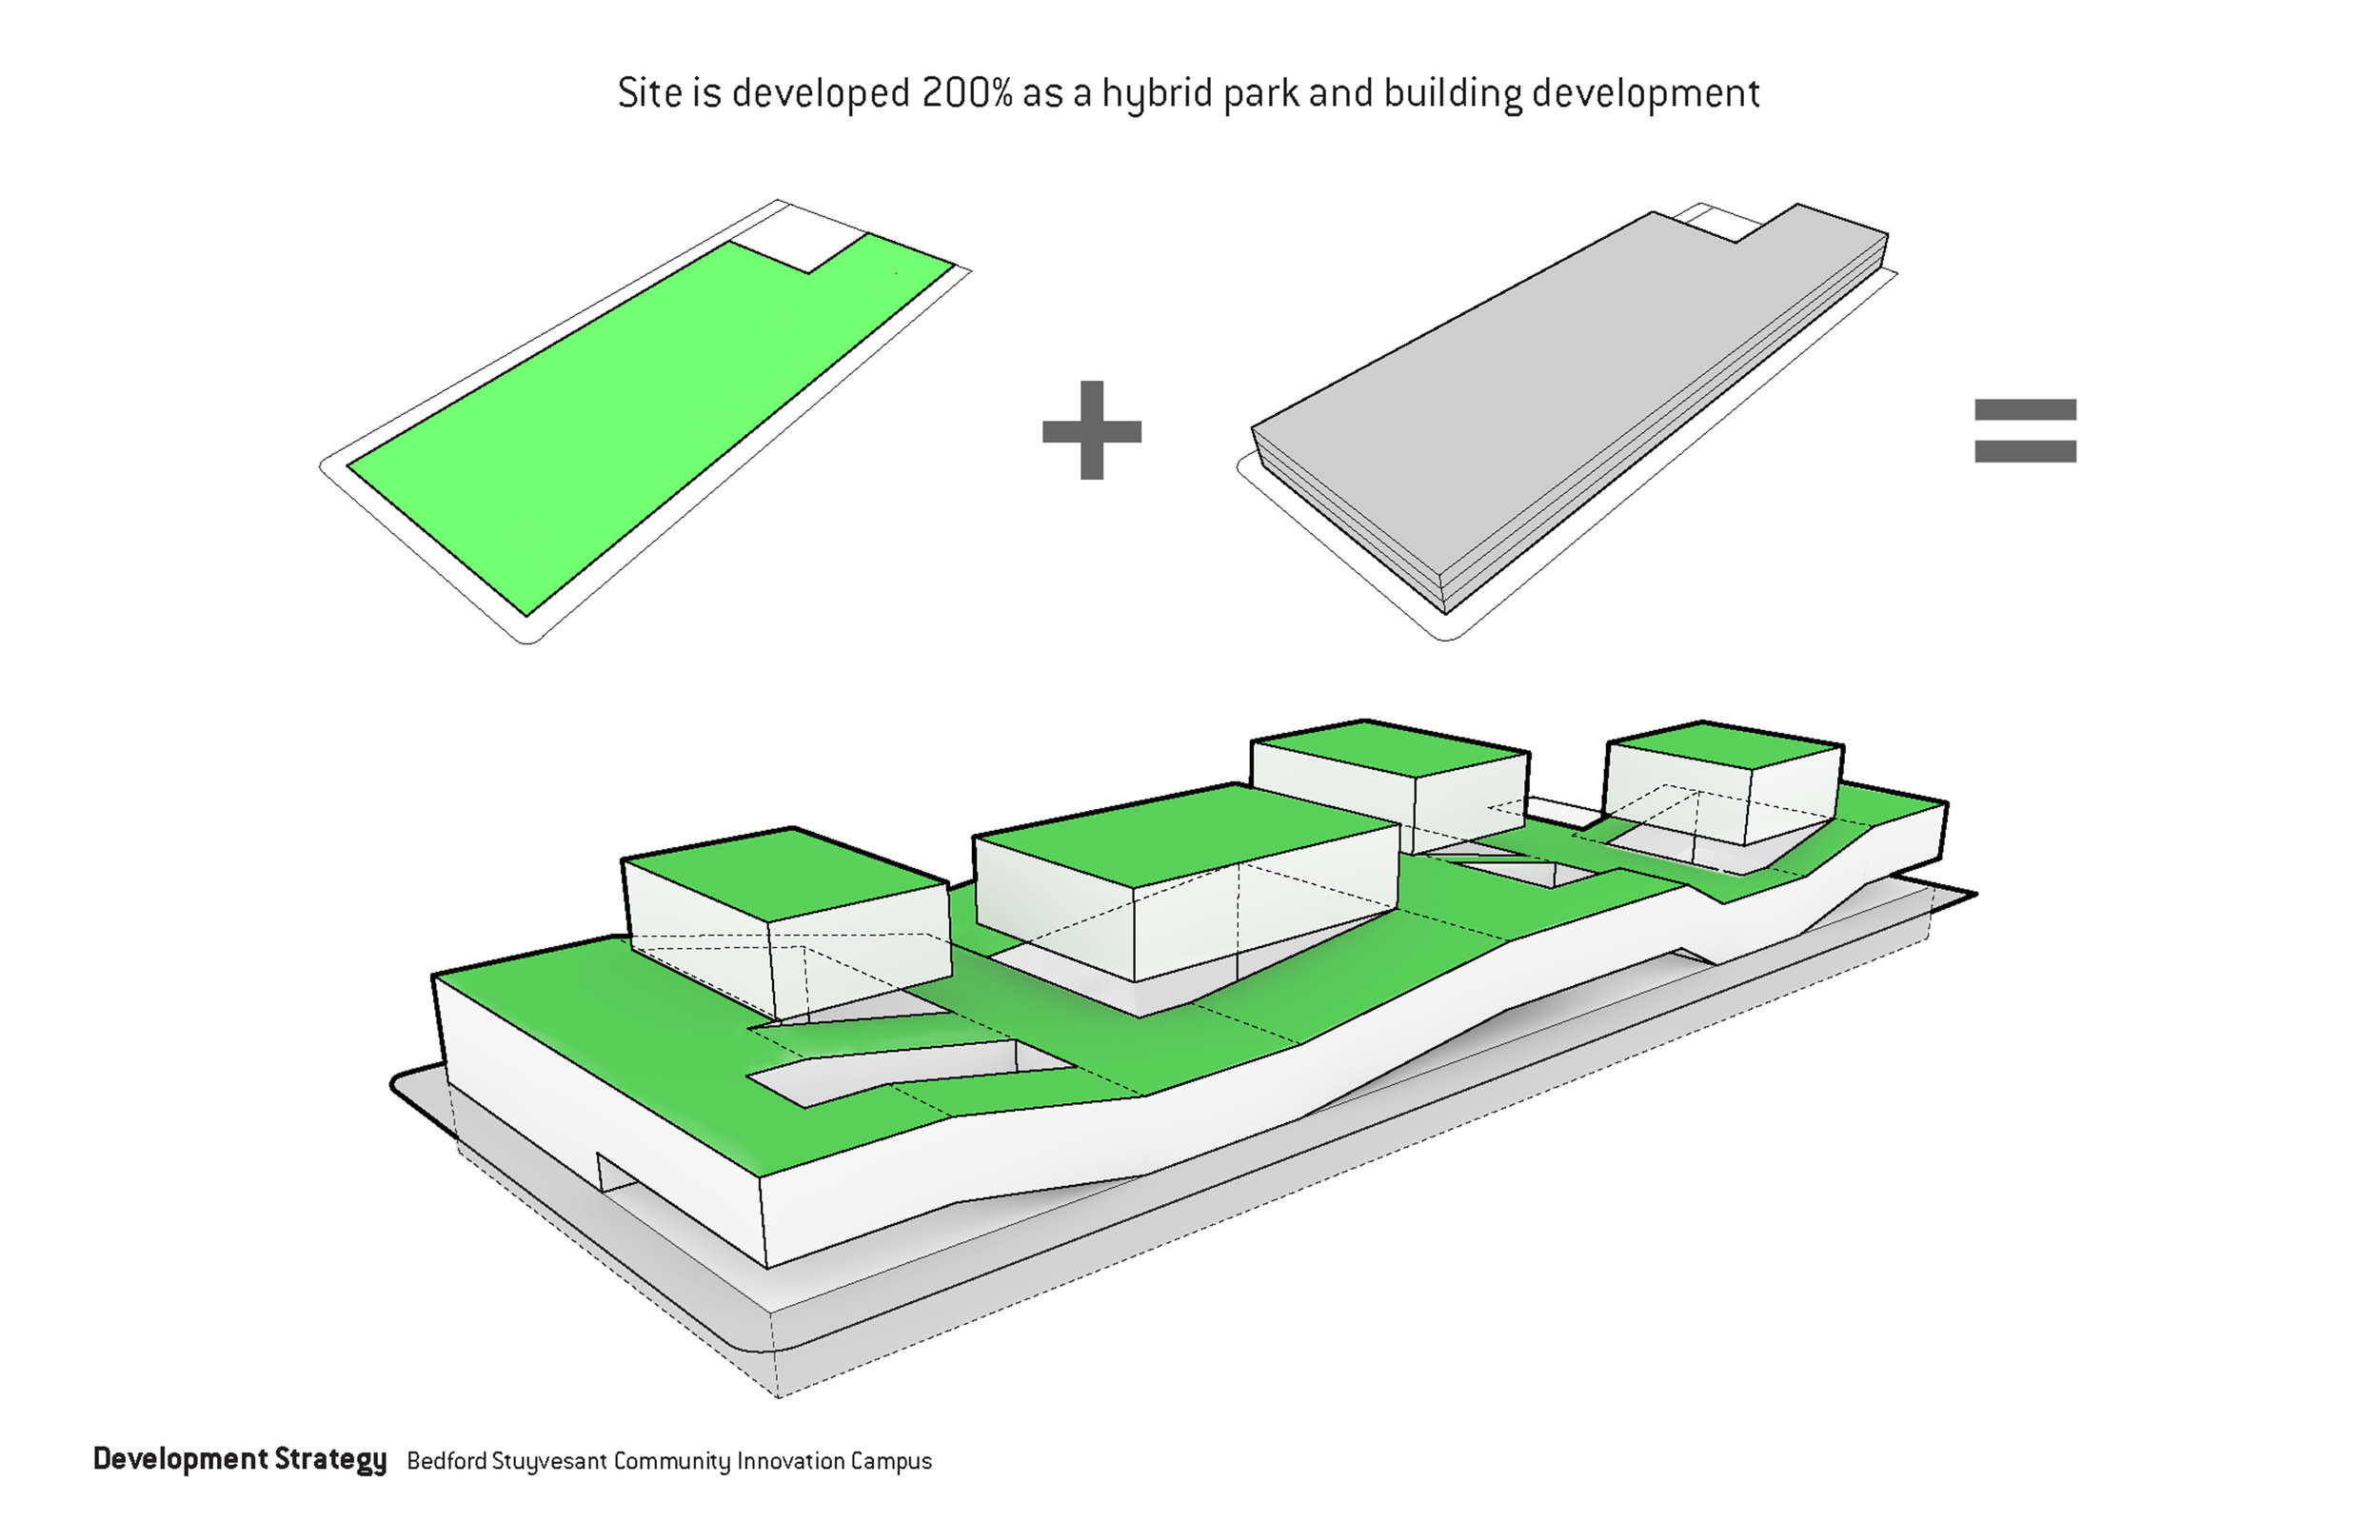 Tentoone_Bed Stuy CIC_Presentation 062118_Page_04_Development Strategy.jpg